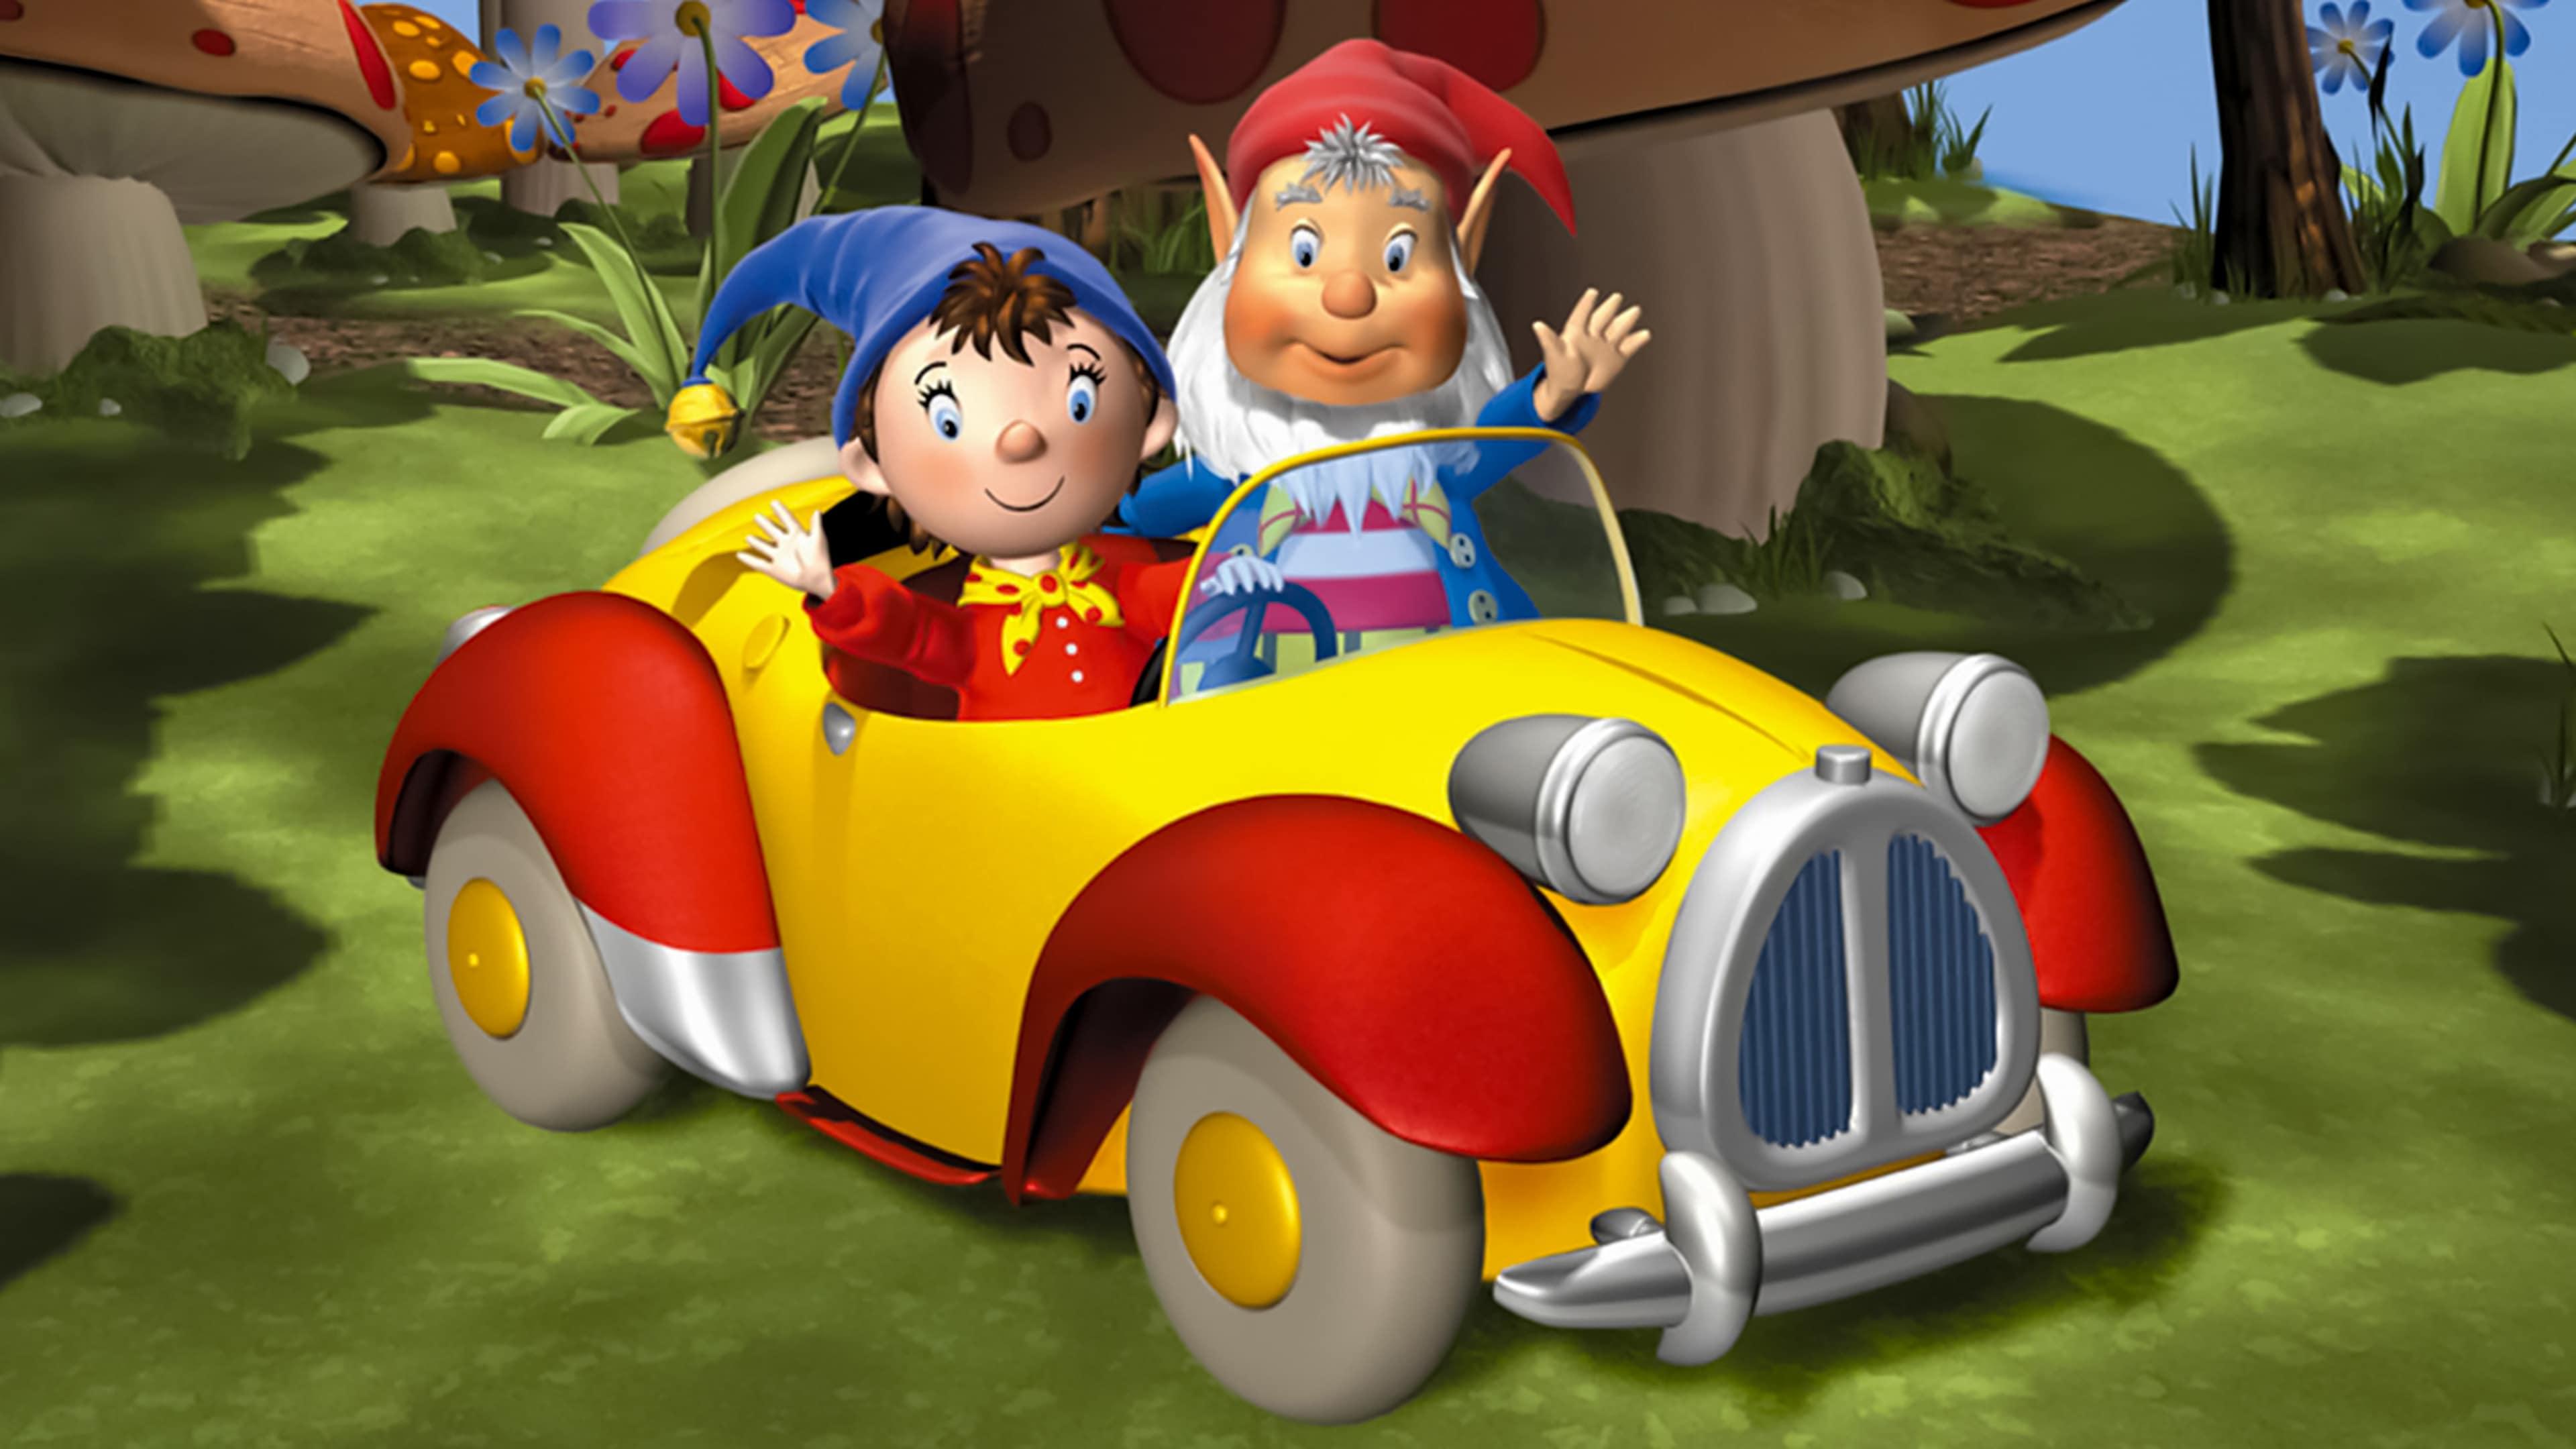 Noddy the Champion